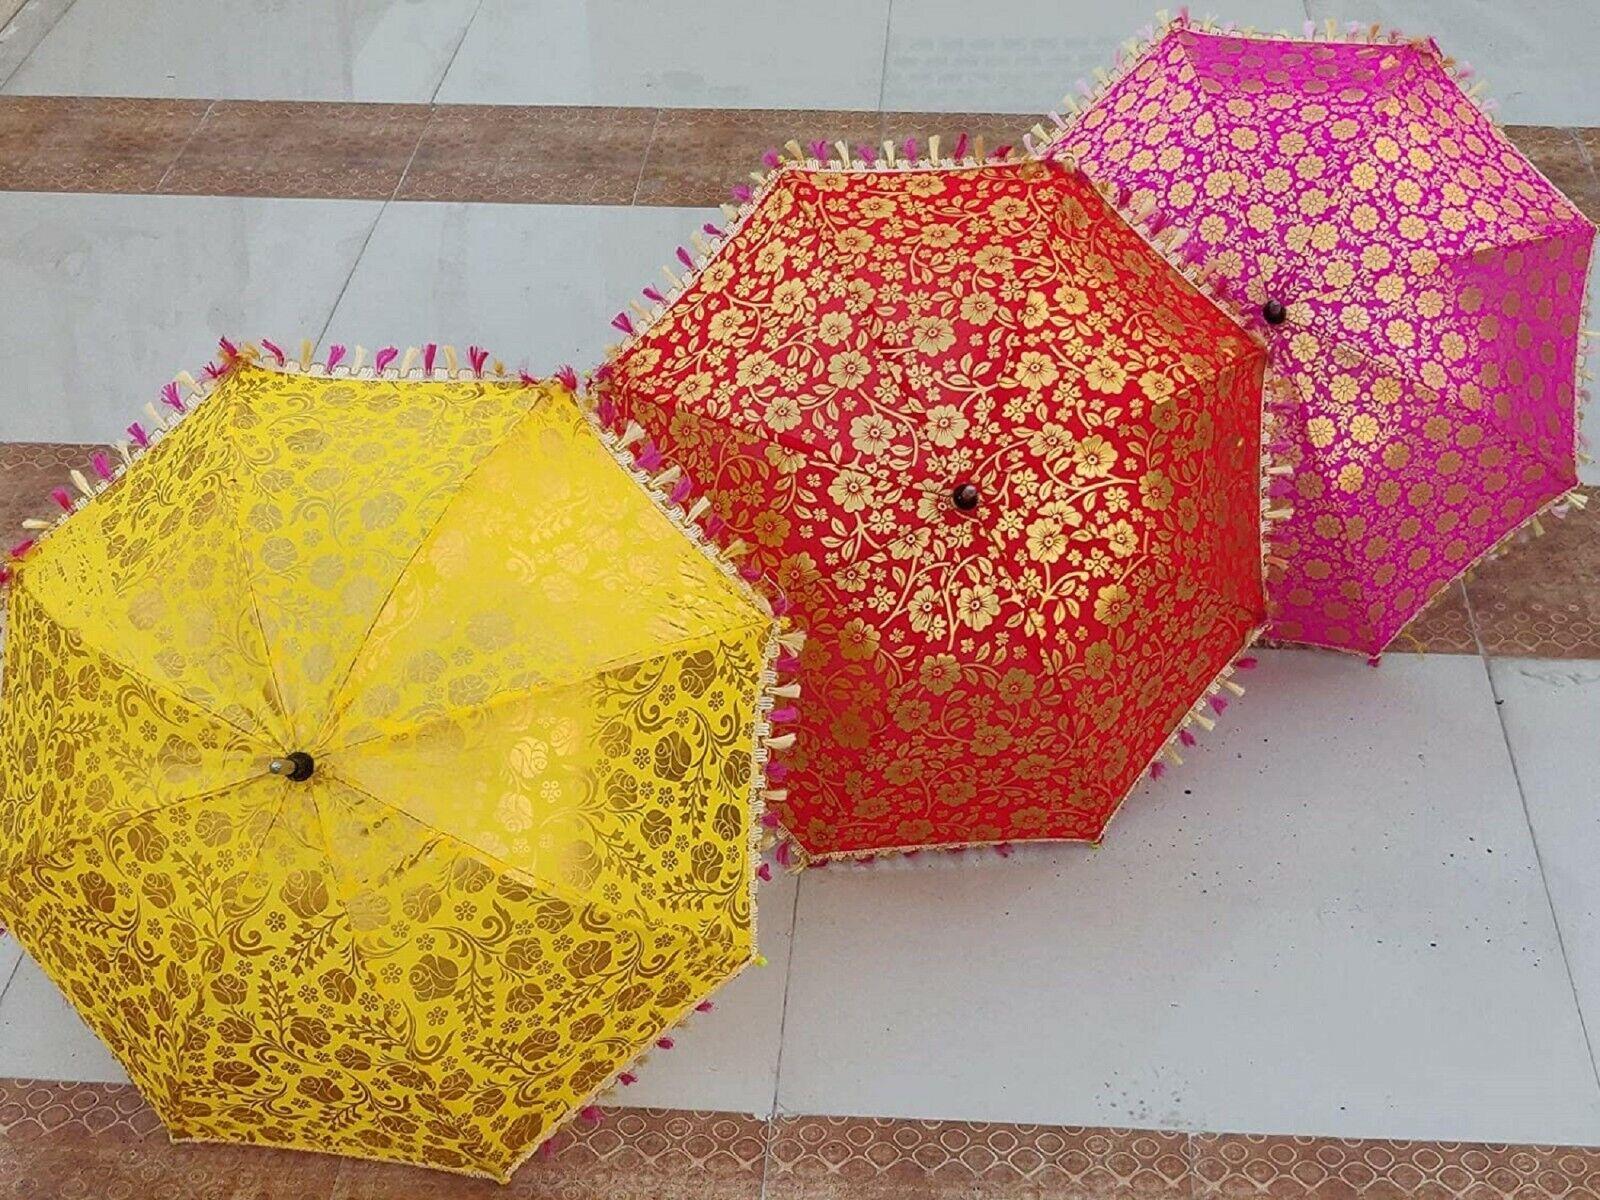 Handmade Printed Gold Flower Umbrellas Indian Women's Kids Sun Shade Parasols